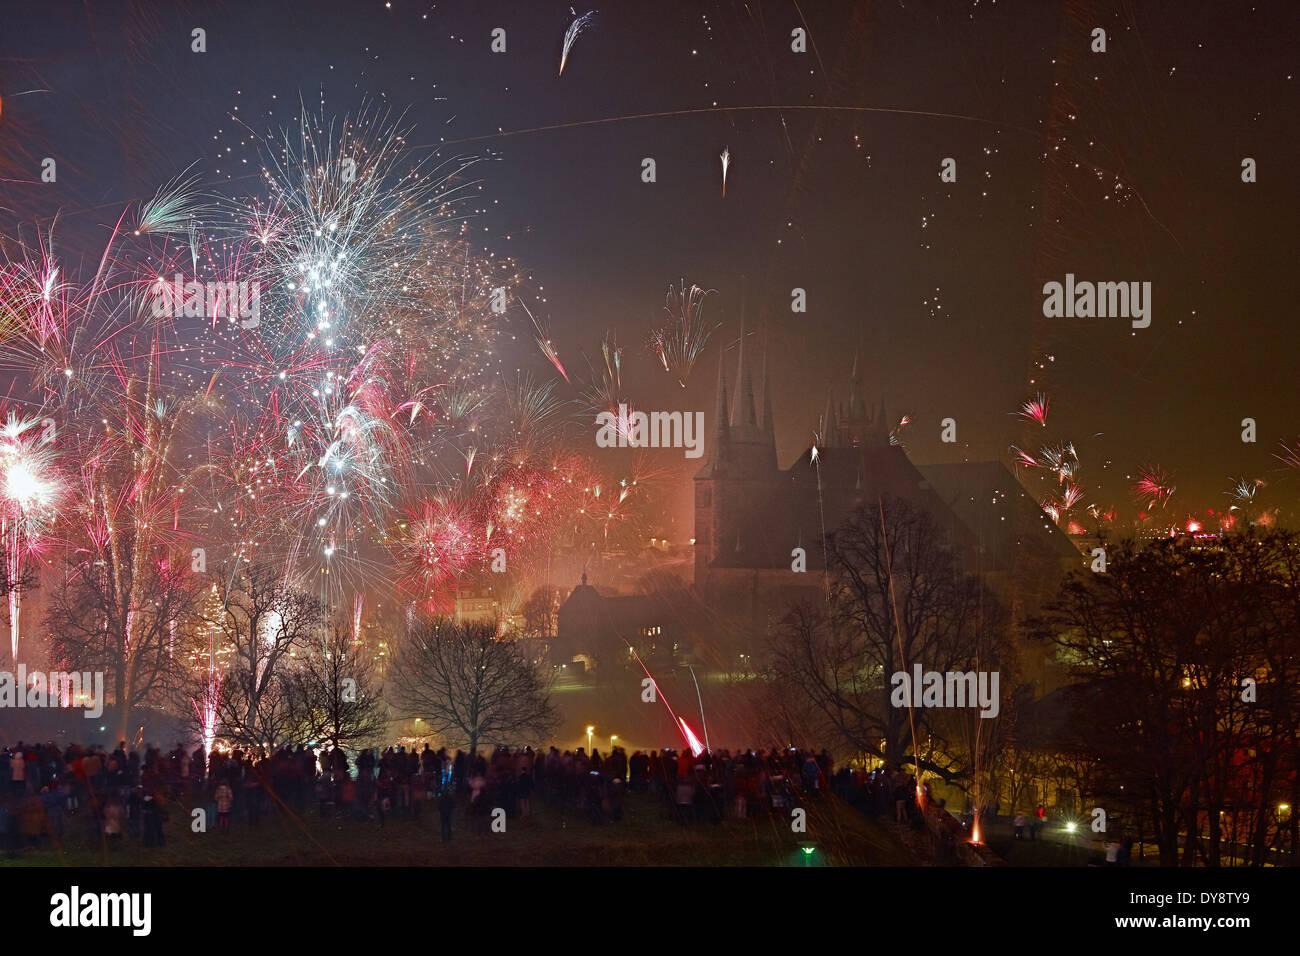 New Year's Eve fireworks, Erfurt, Germany - Stock Image